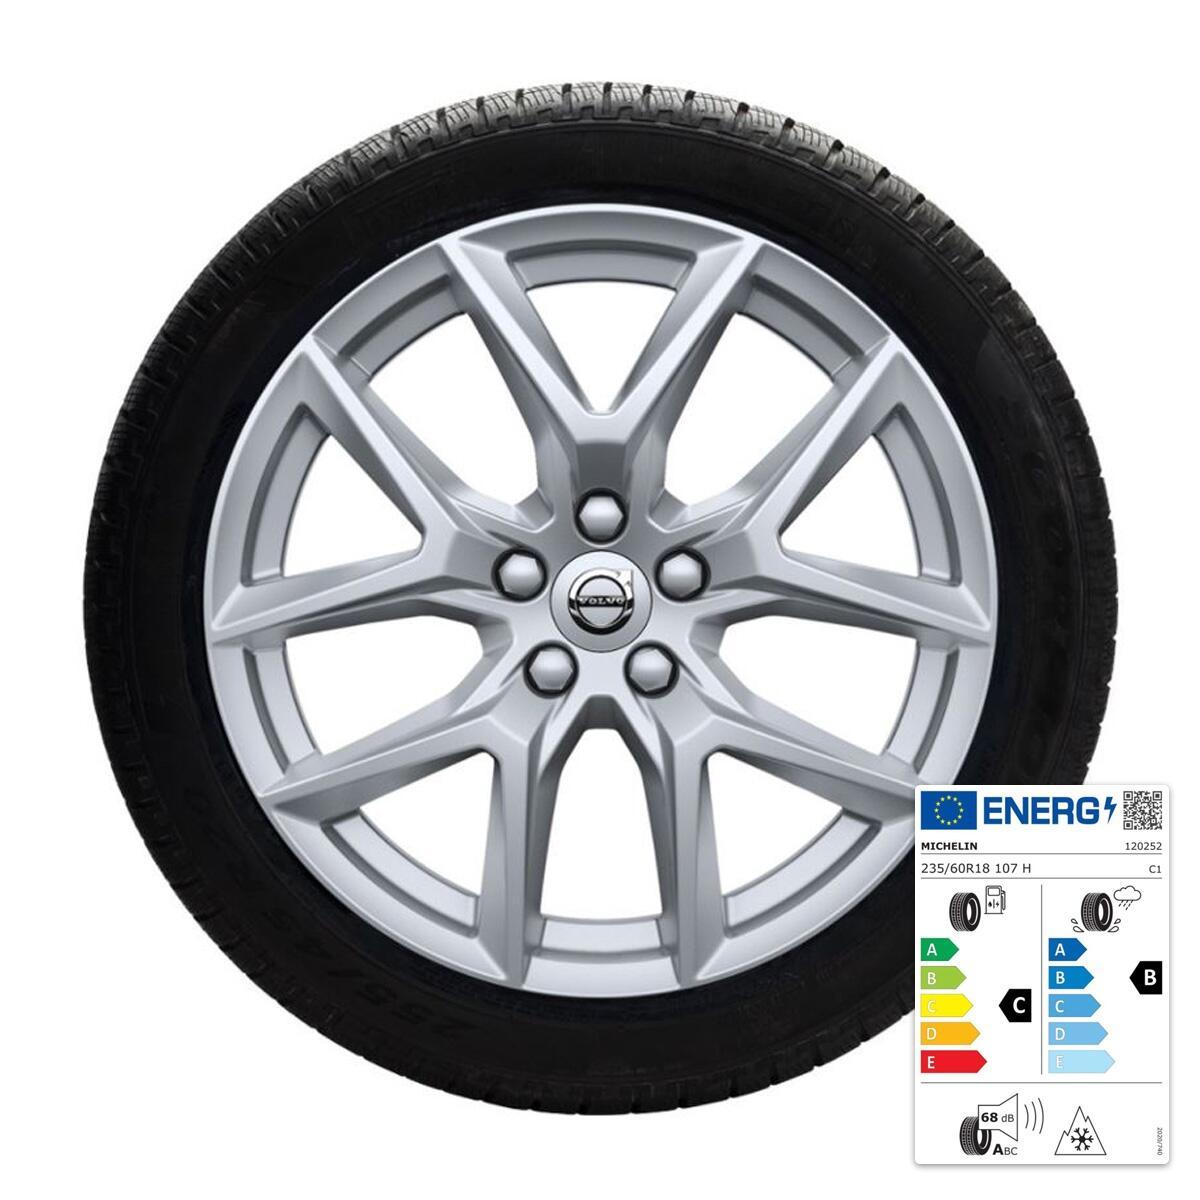 Komplet zimskih koles: 45,70 cm (18''), pnevmatike Michelin